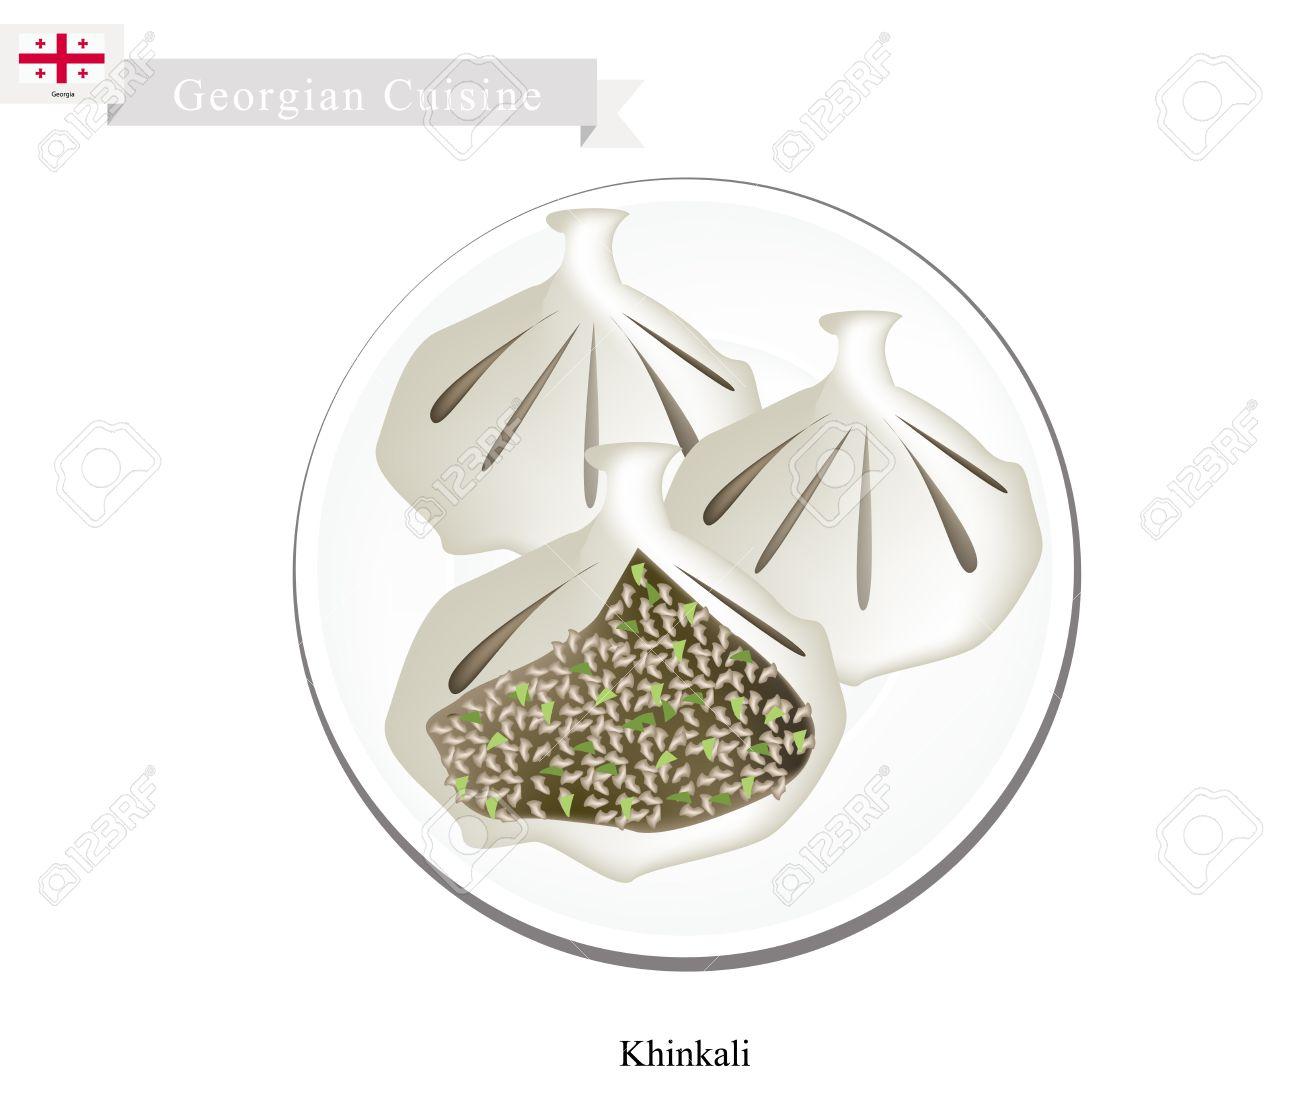 Georgian Cuisine, Khinkali Or Dumpling Made Of Twisted Knobs.